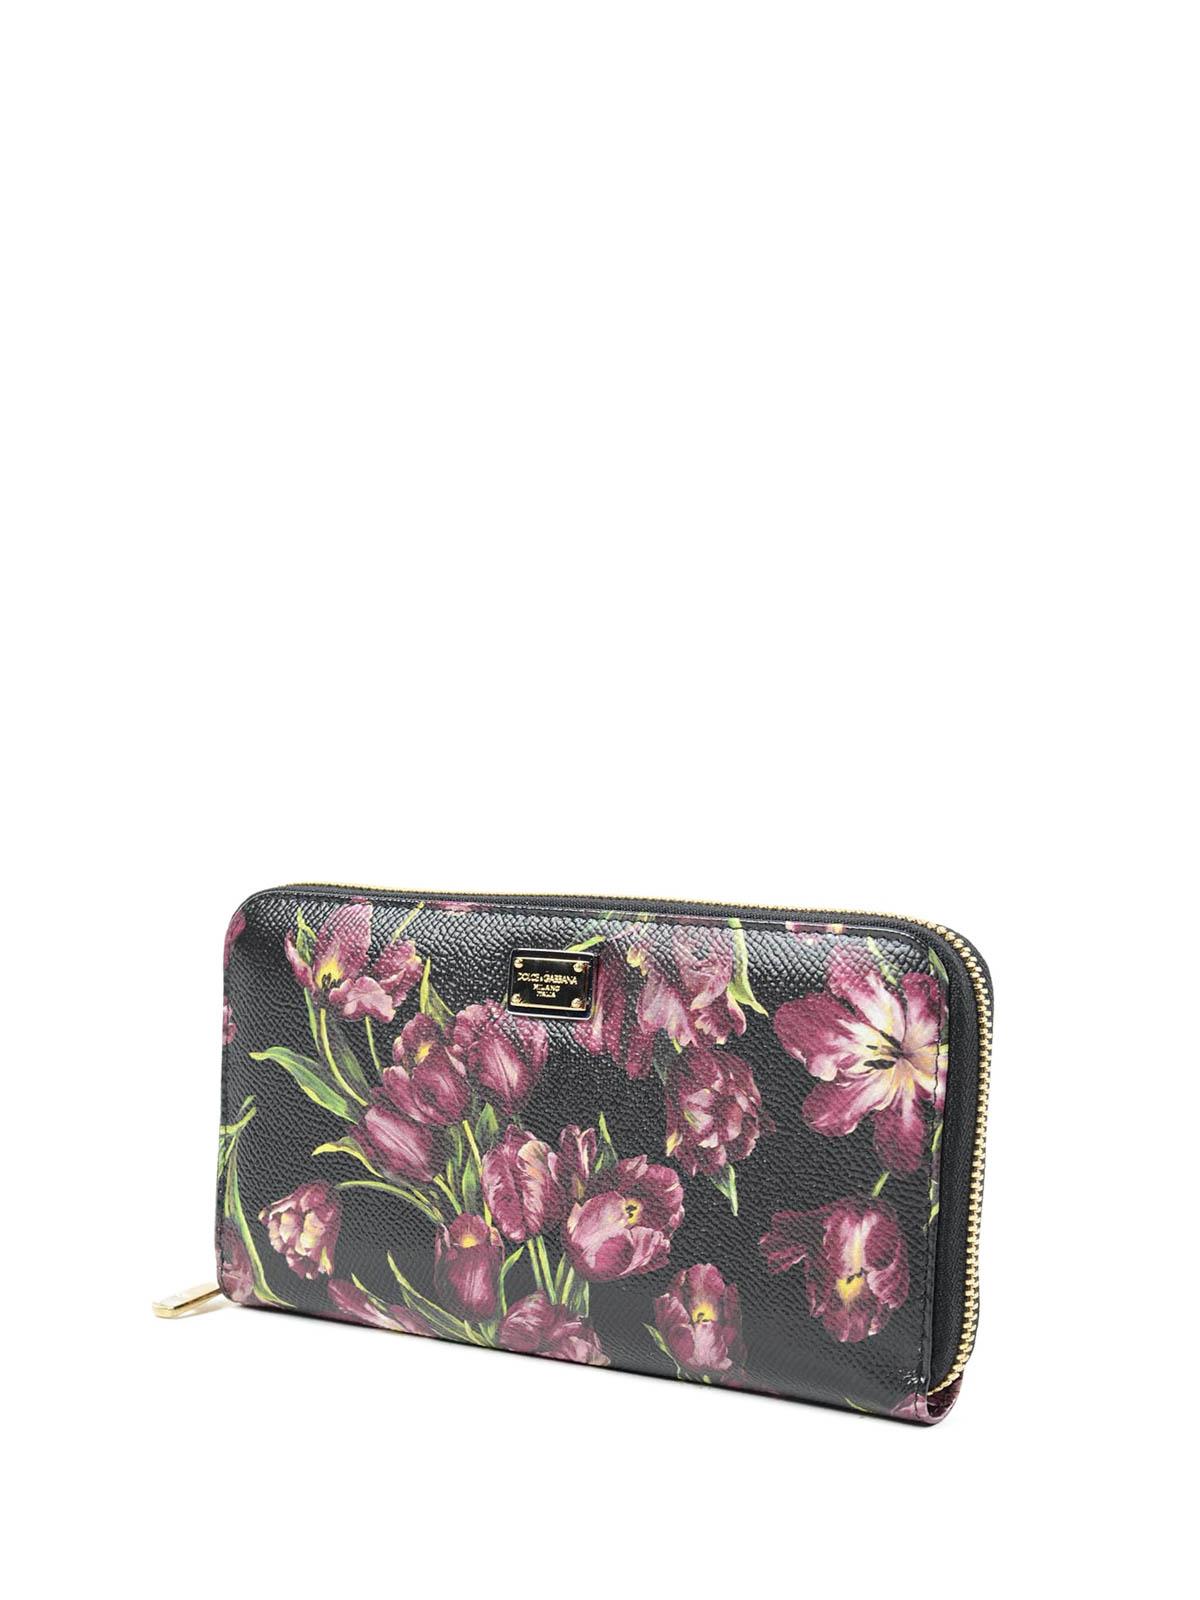 132ec1baab DOLCE & GABBANA: portafogli online - Portafoglio stampa tulipani